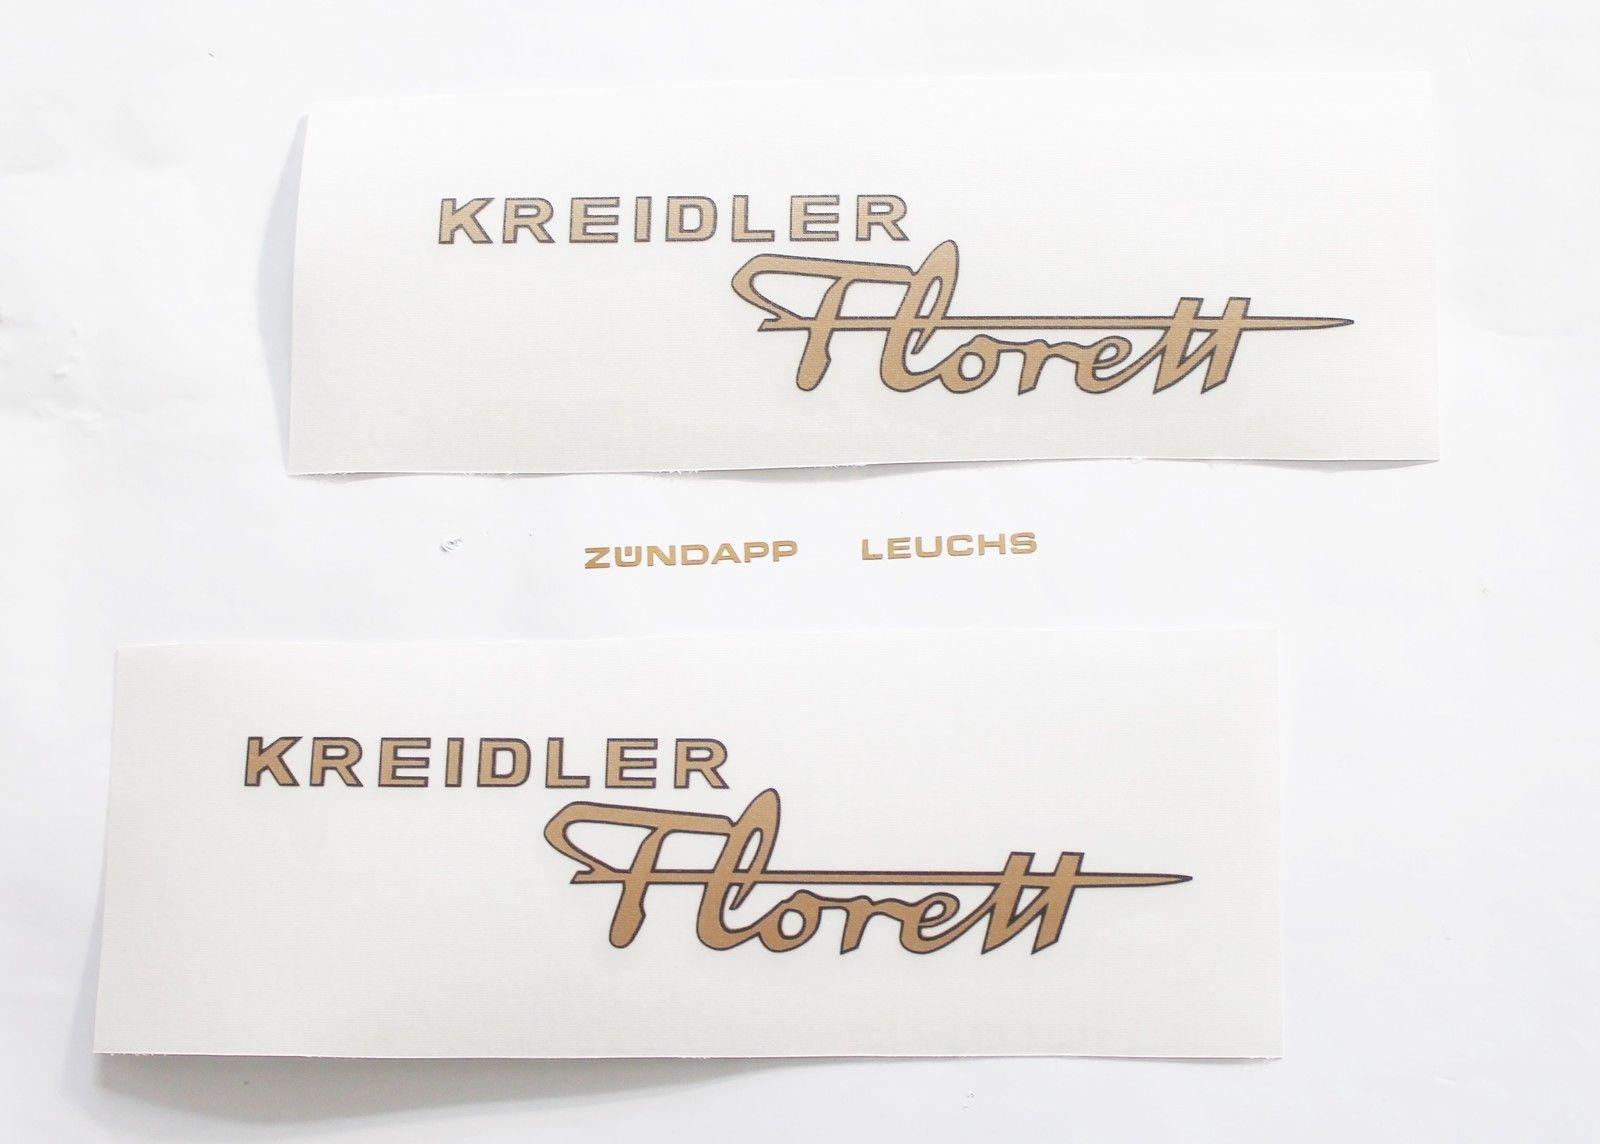 Kreidler Florett K 54 Lf Lh Lfh 2 X Rahmen Aufkleber In Goldschwarz 135mm